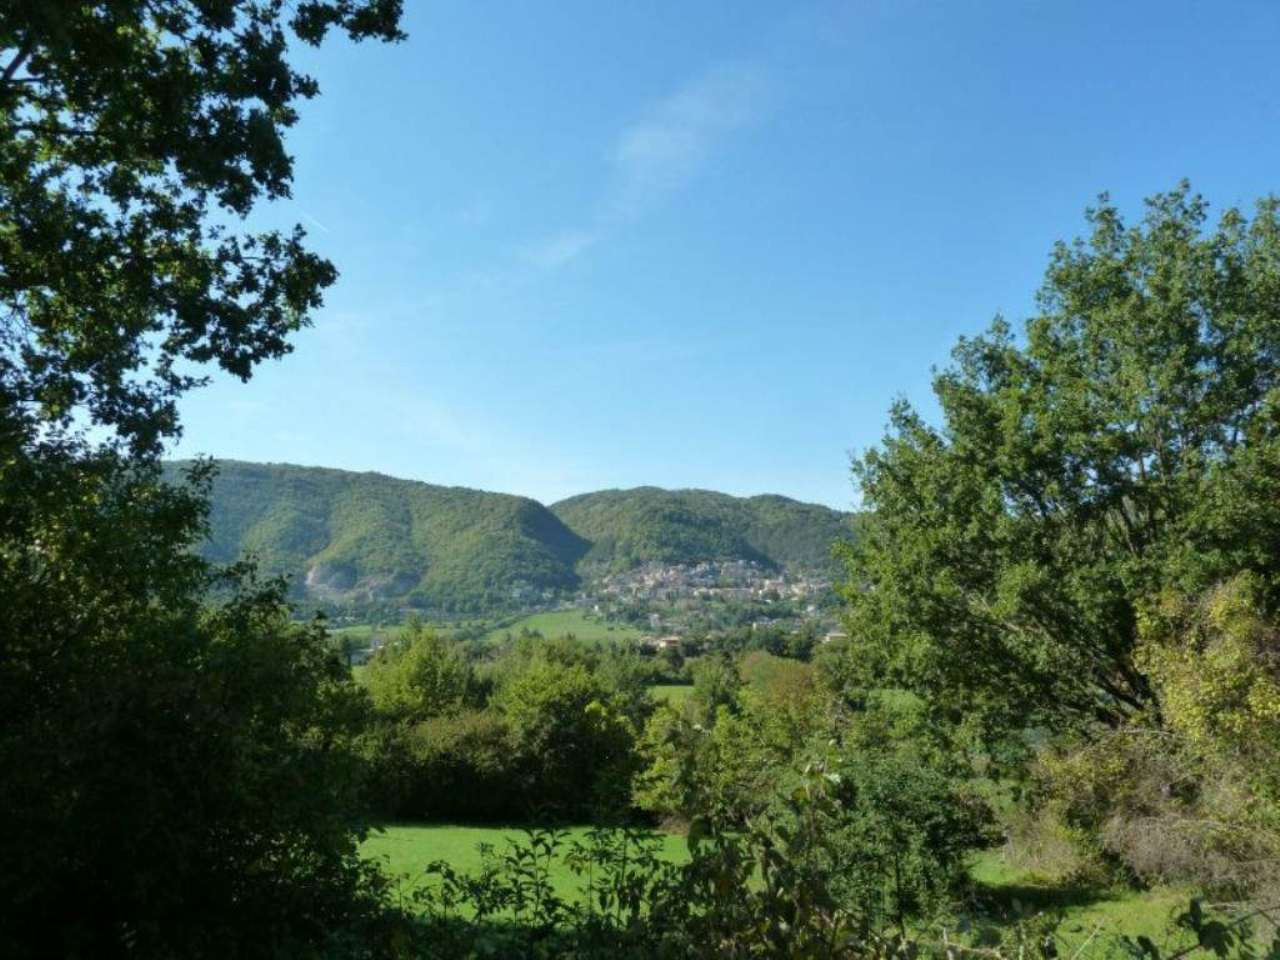 Rustico / Casale in Vendita a Rocca di Botte